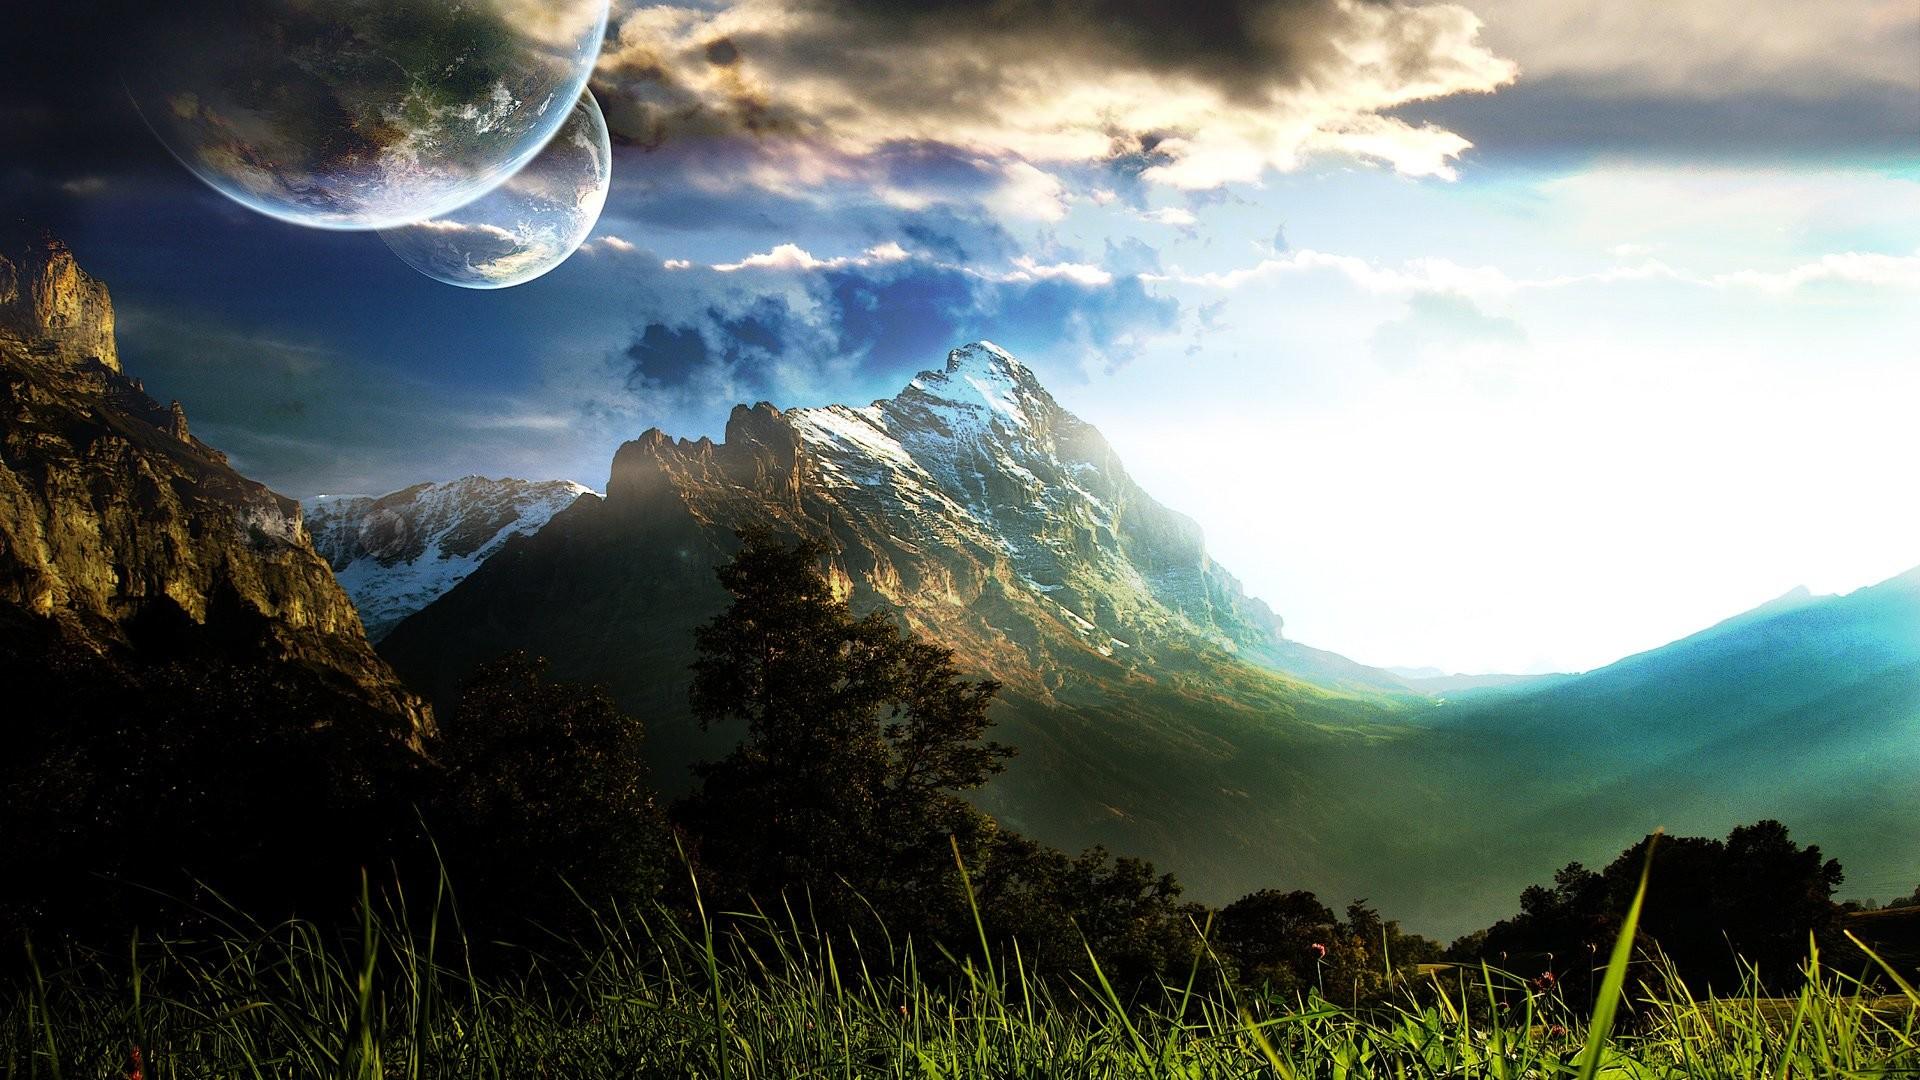 HD Wallpaper   Background ID:83704. Sci Fi Landscape